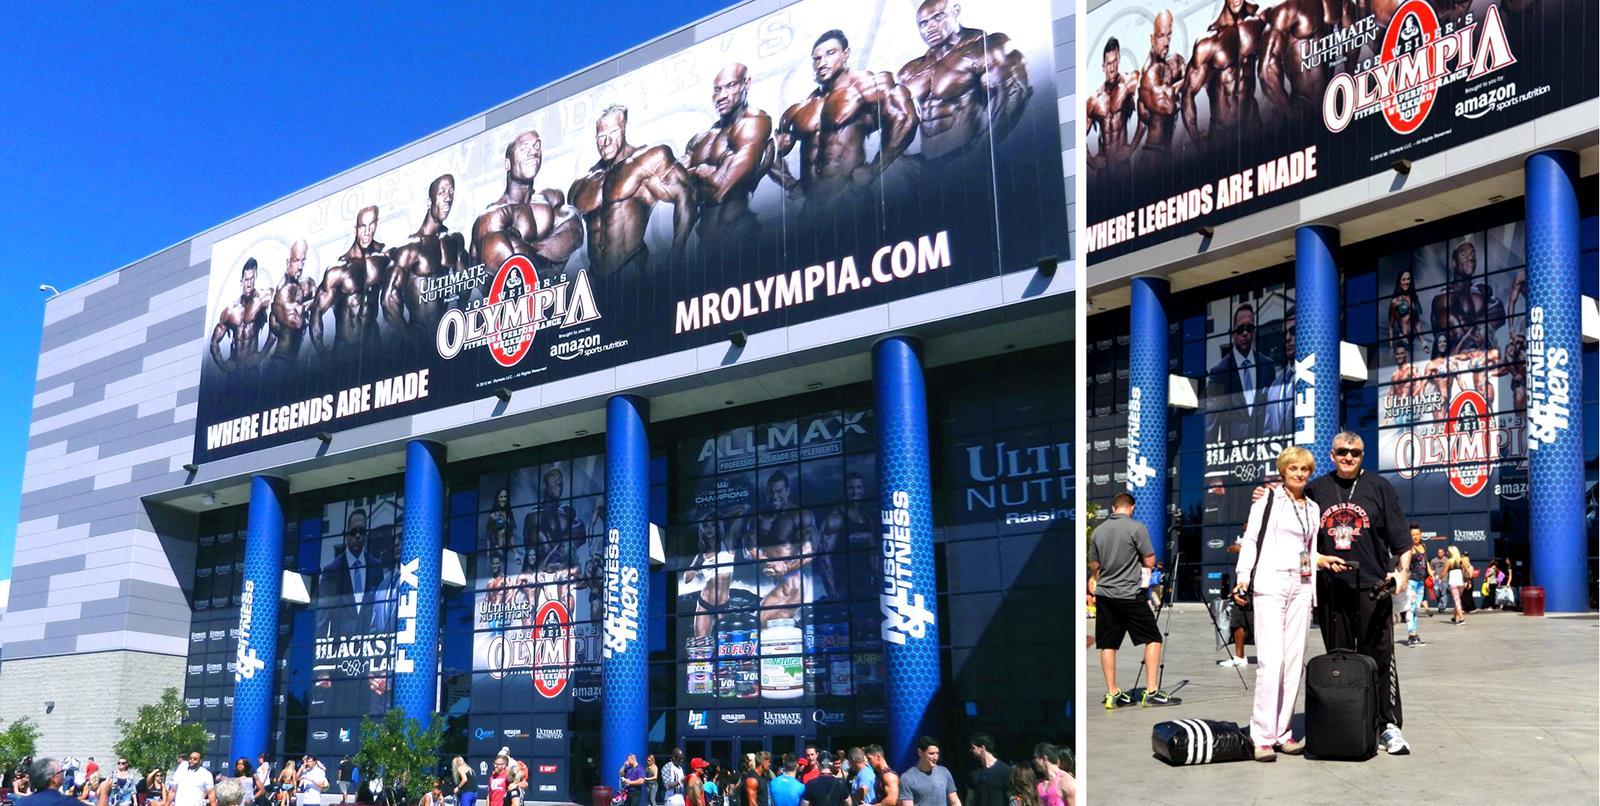 EXPO Convention Center LV 2015